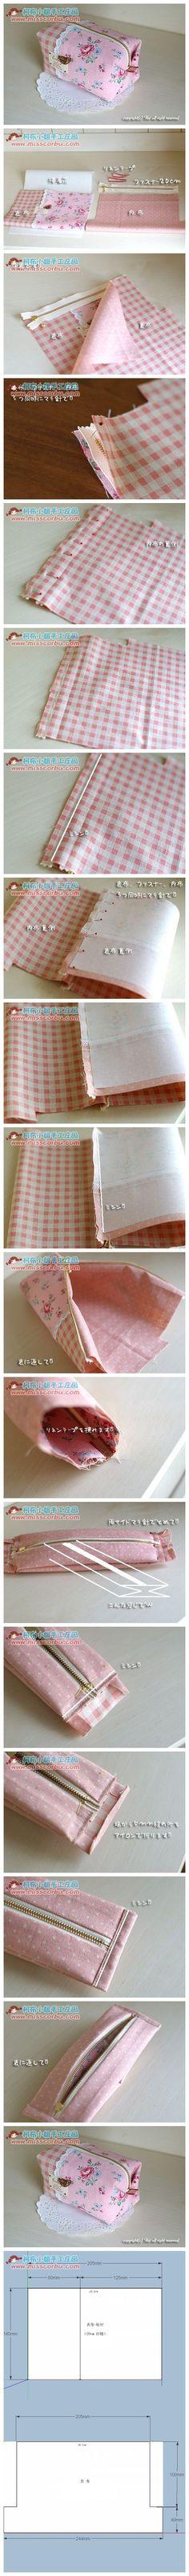 Box Bag Tutorial by maryani